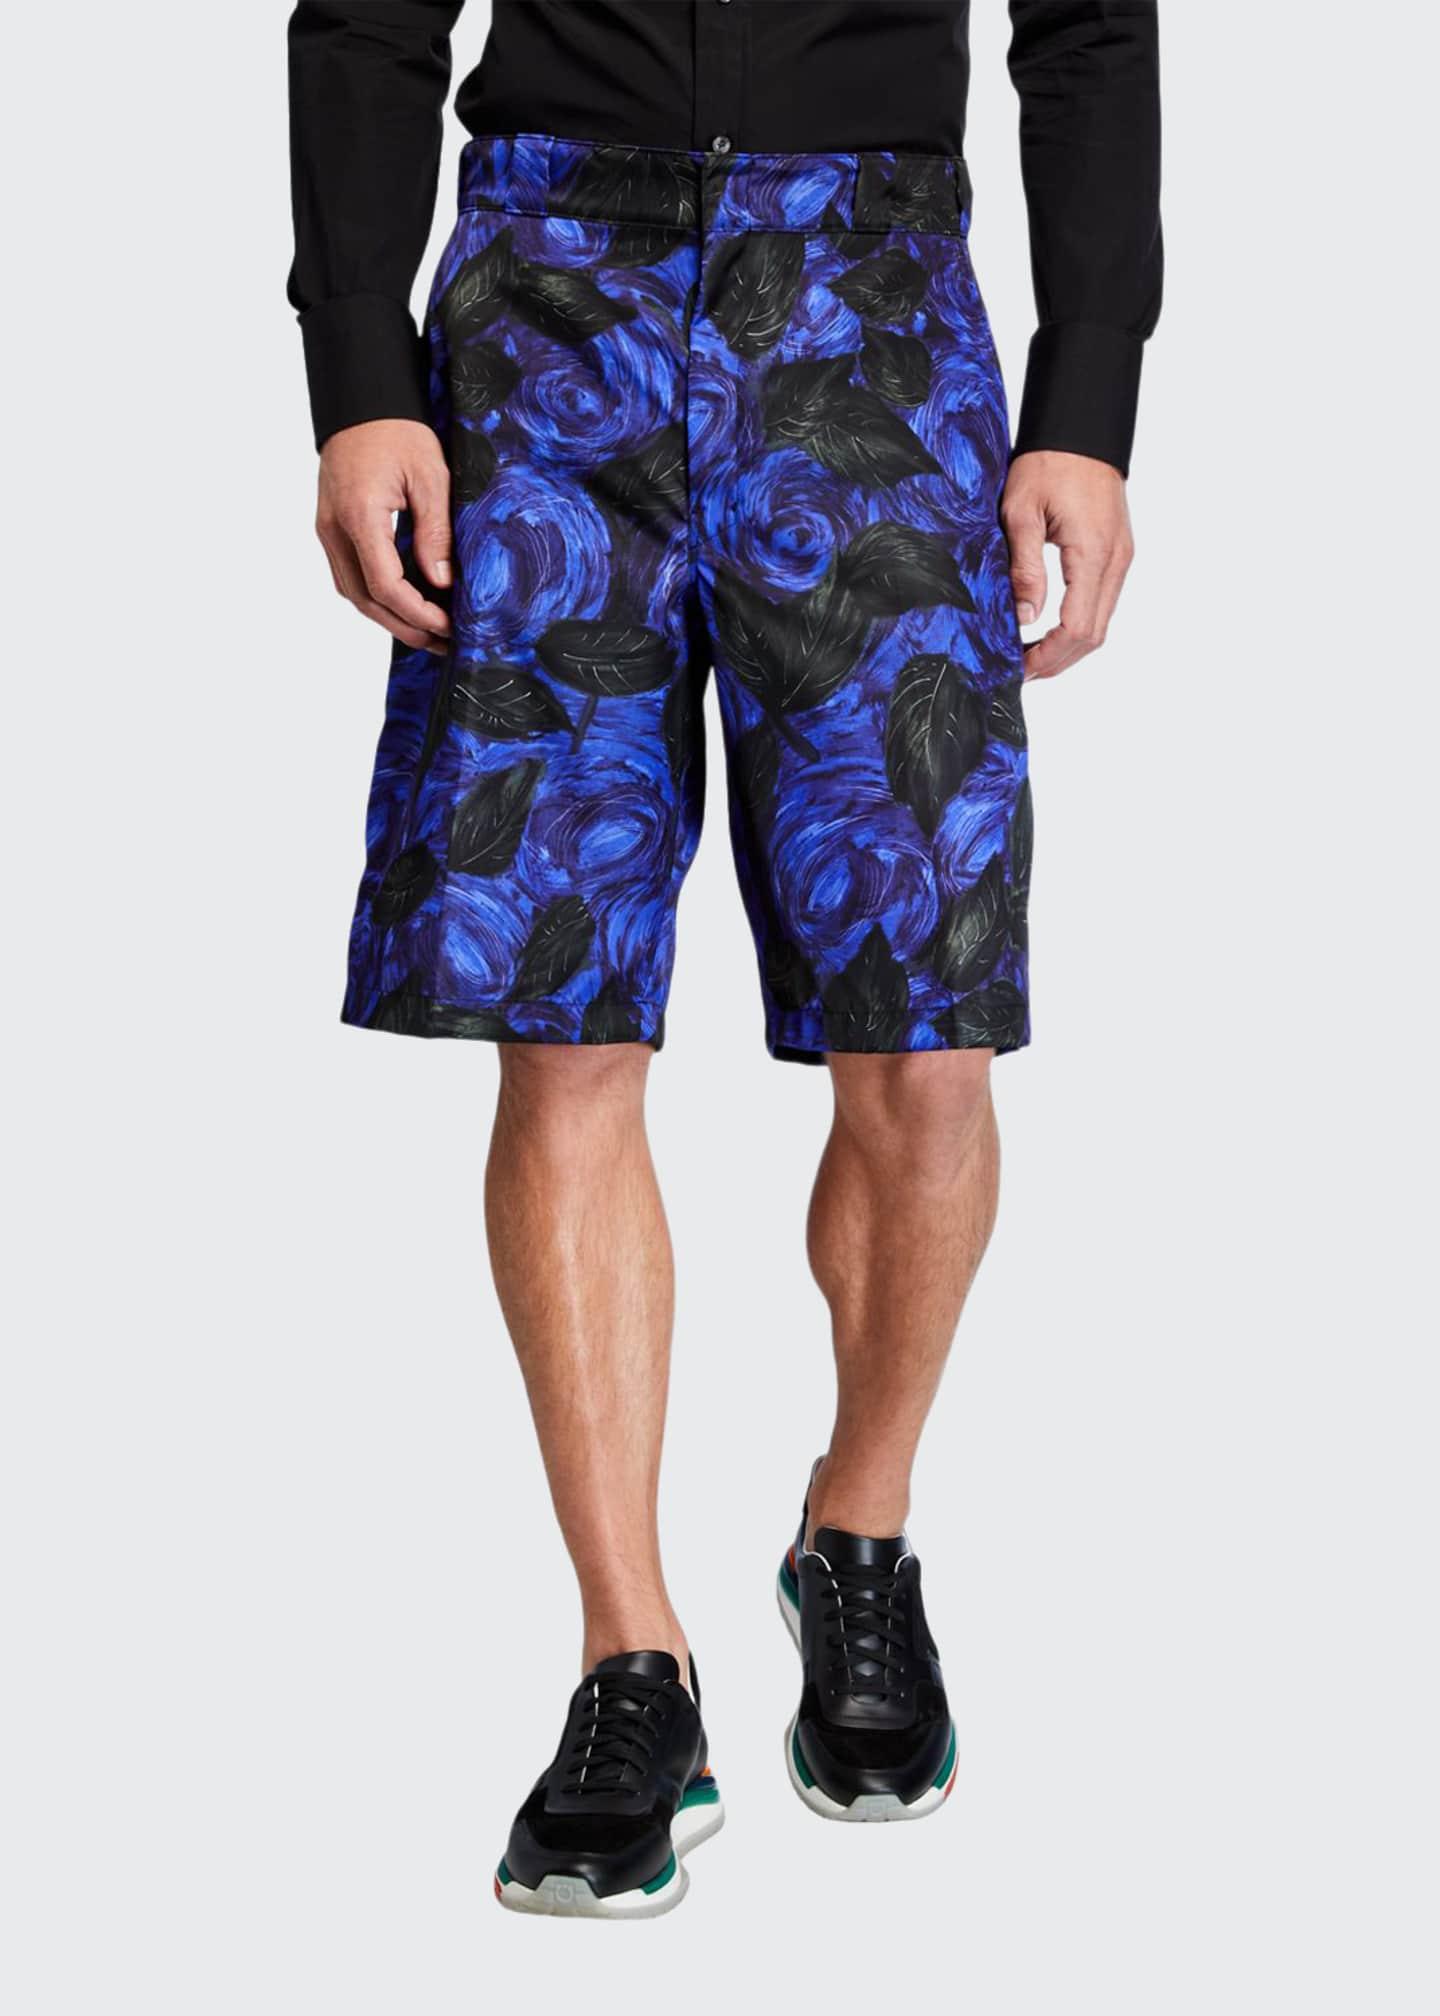 Prada Men's Gabardine Nylon Foliage Shorts